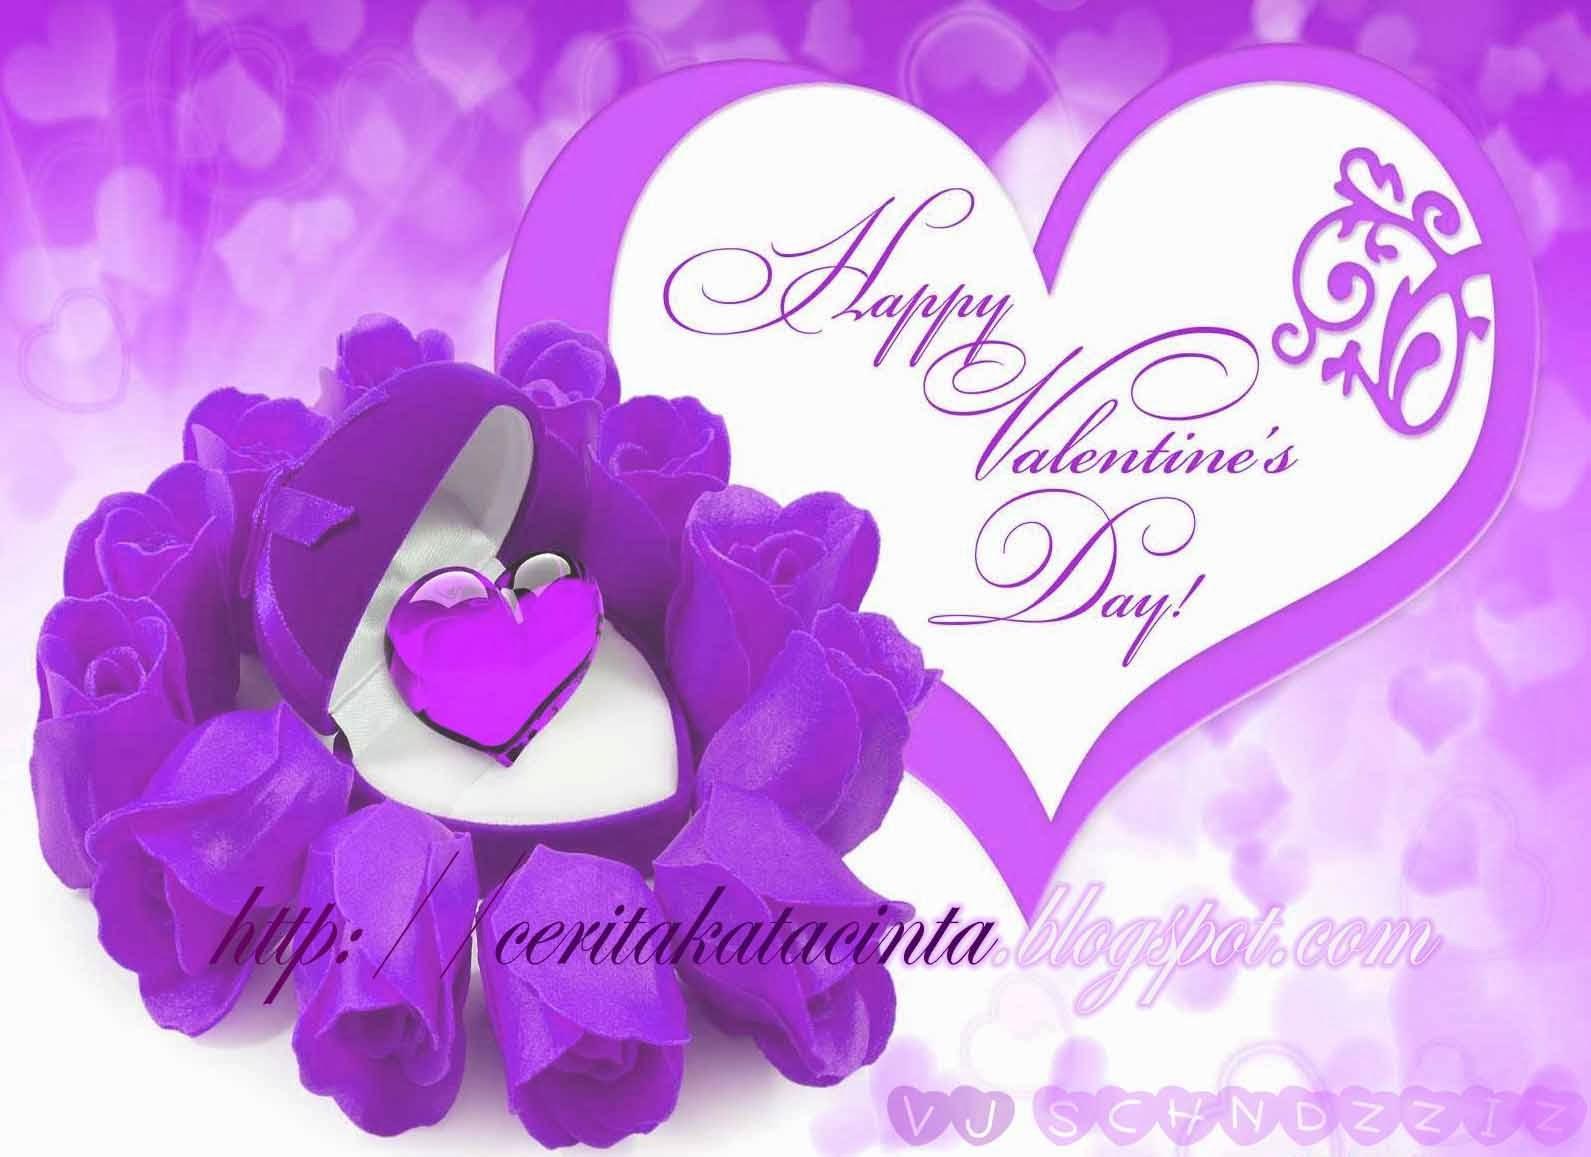 Kartu Ucapan Happy Valentines Day 2014 Romancejpg